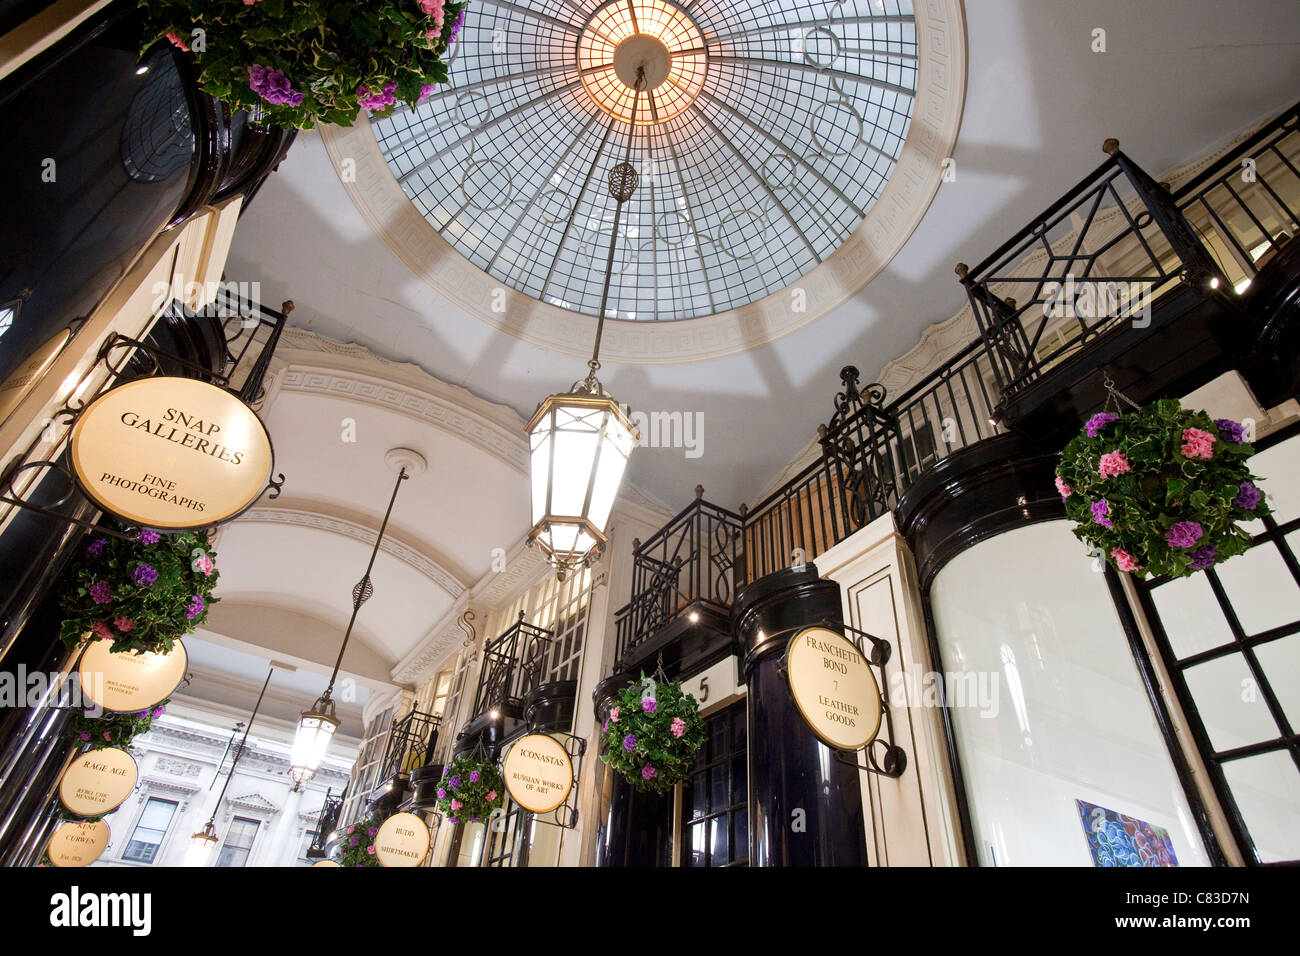 Piccadilly Arcade, London, England - Stock Image